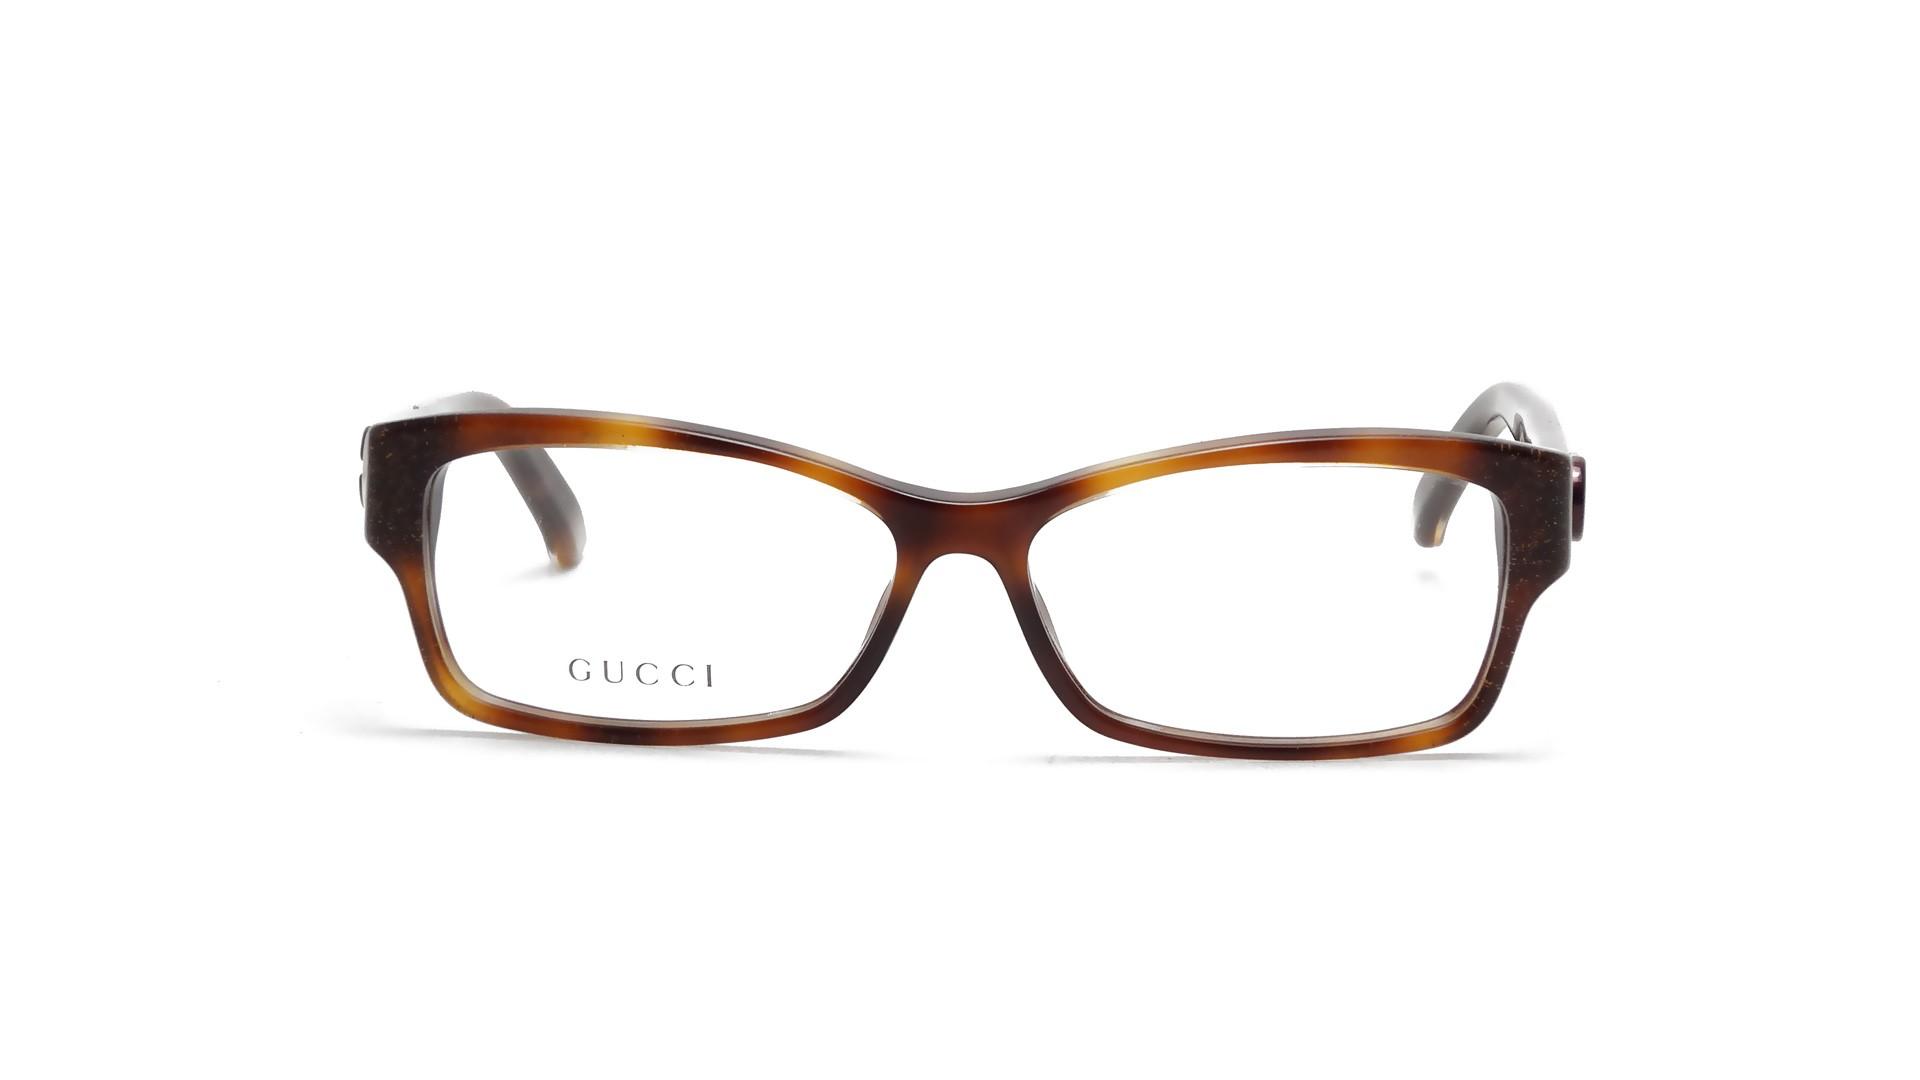 Gucci Tortoise Eyeglass Frames : Gucci GG3203 PWT 53-13 Tortoise Visiofactory